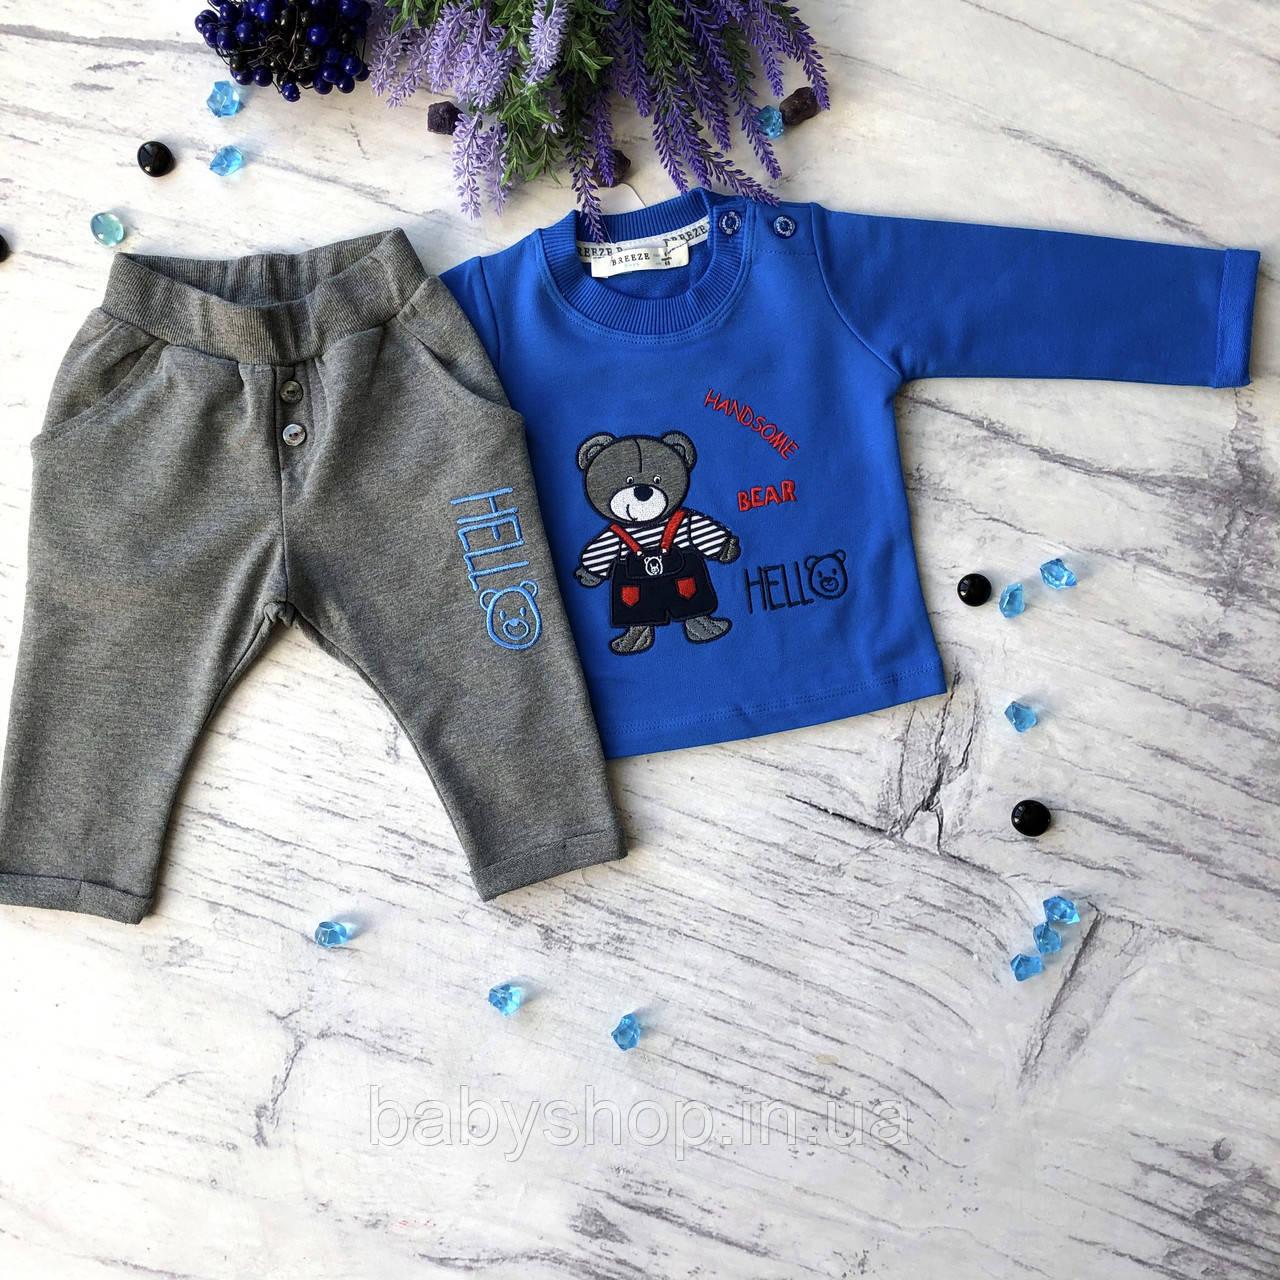 Синий костюм на мальчика Breeze 143. Размер 74 см, 80 см